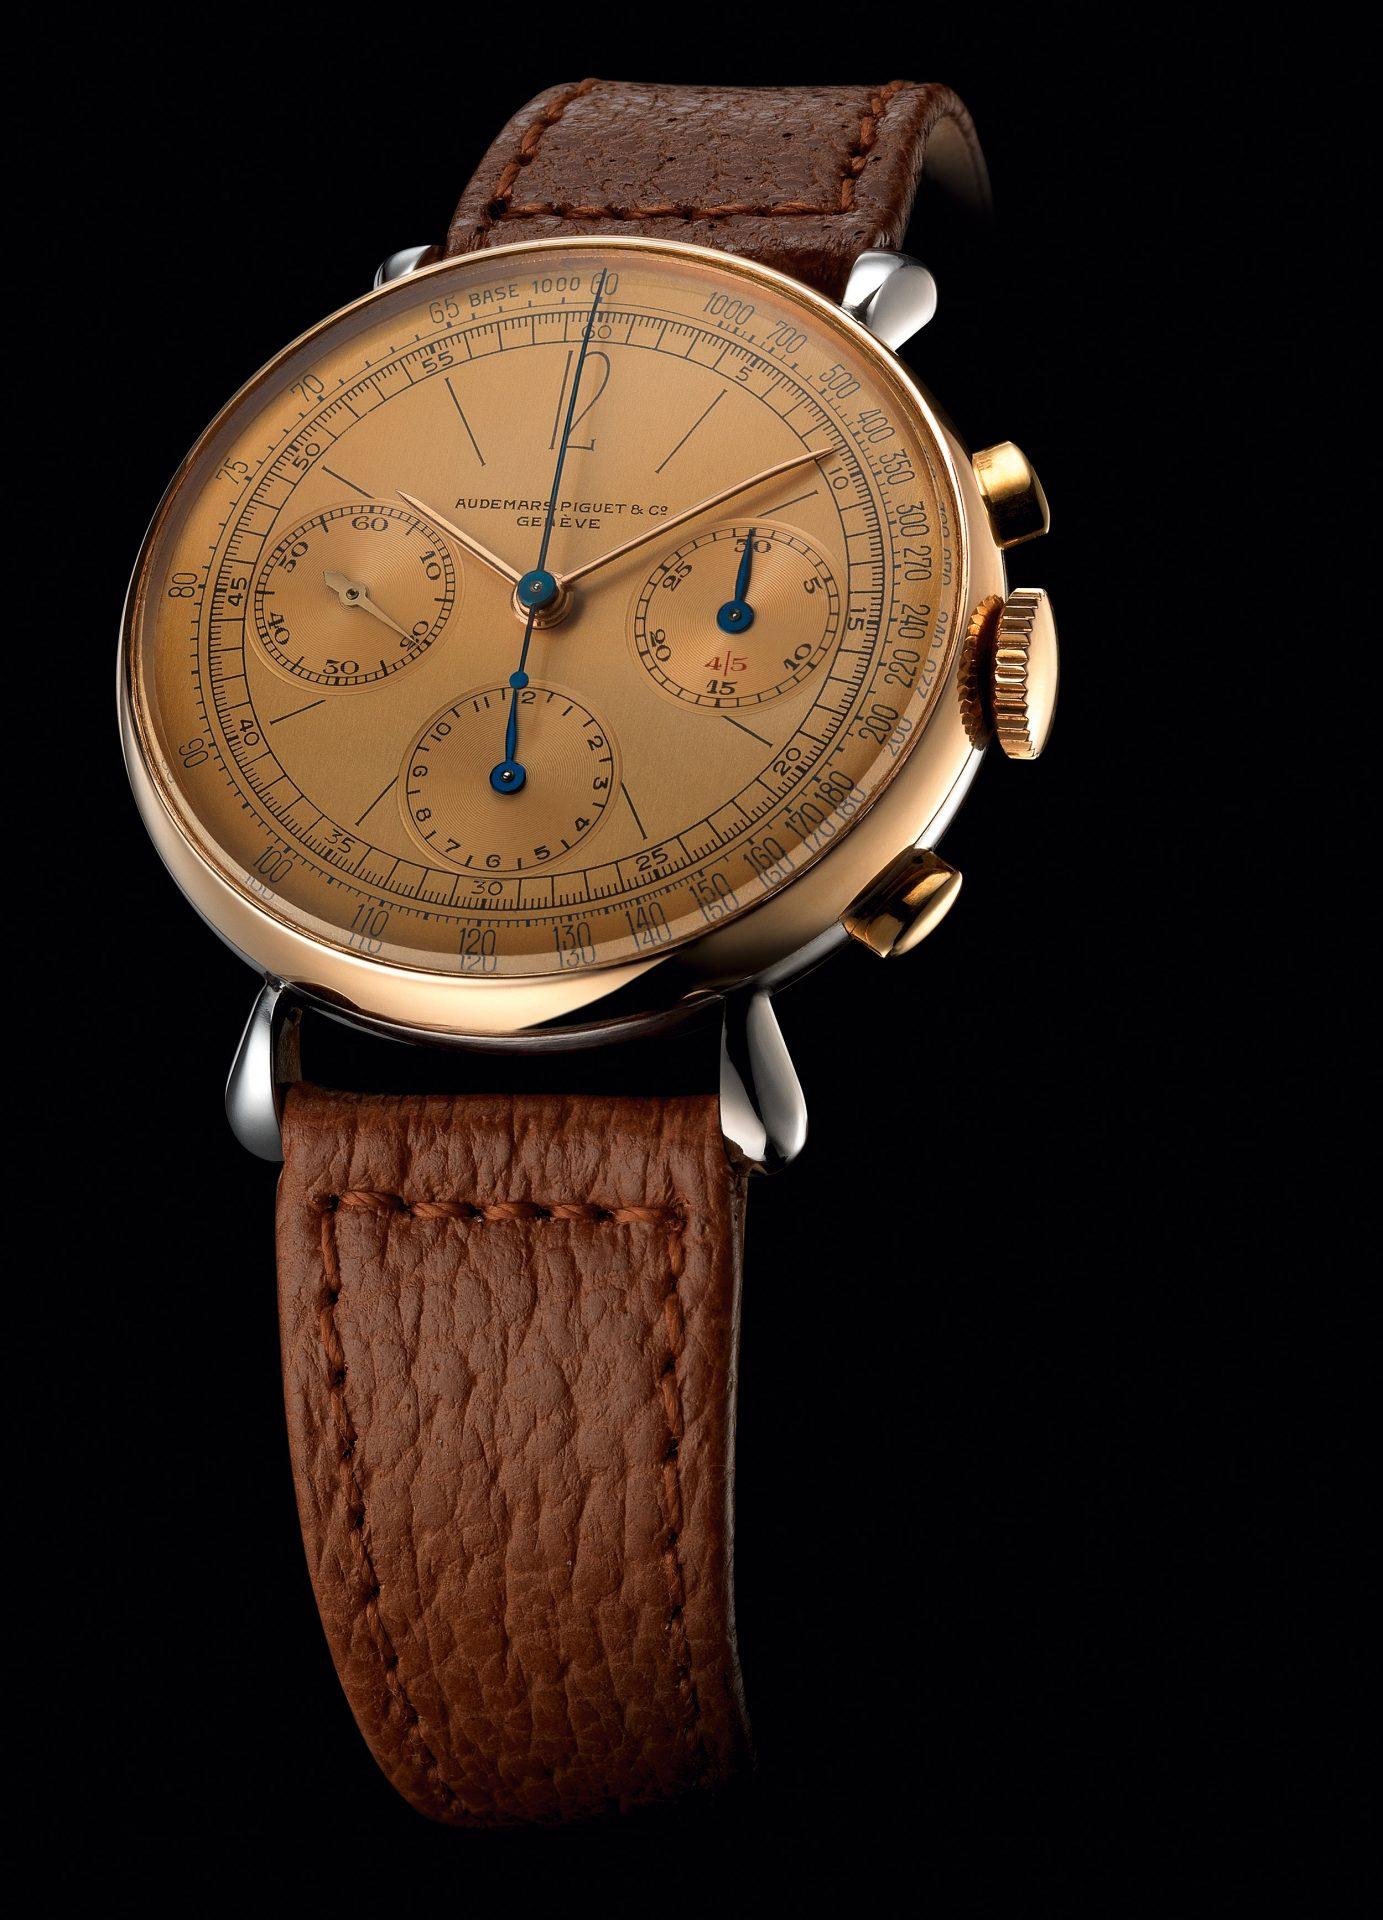 Antiguo reloj de Audemars Piguet con indicador cronógrafo de 45 minutos